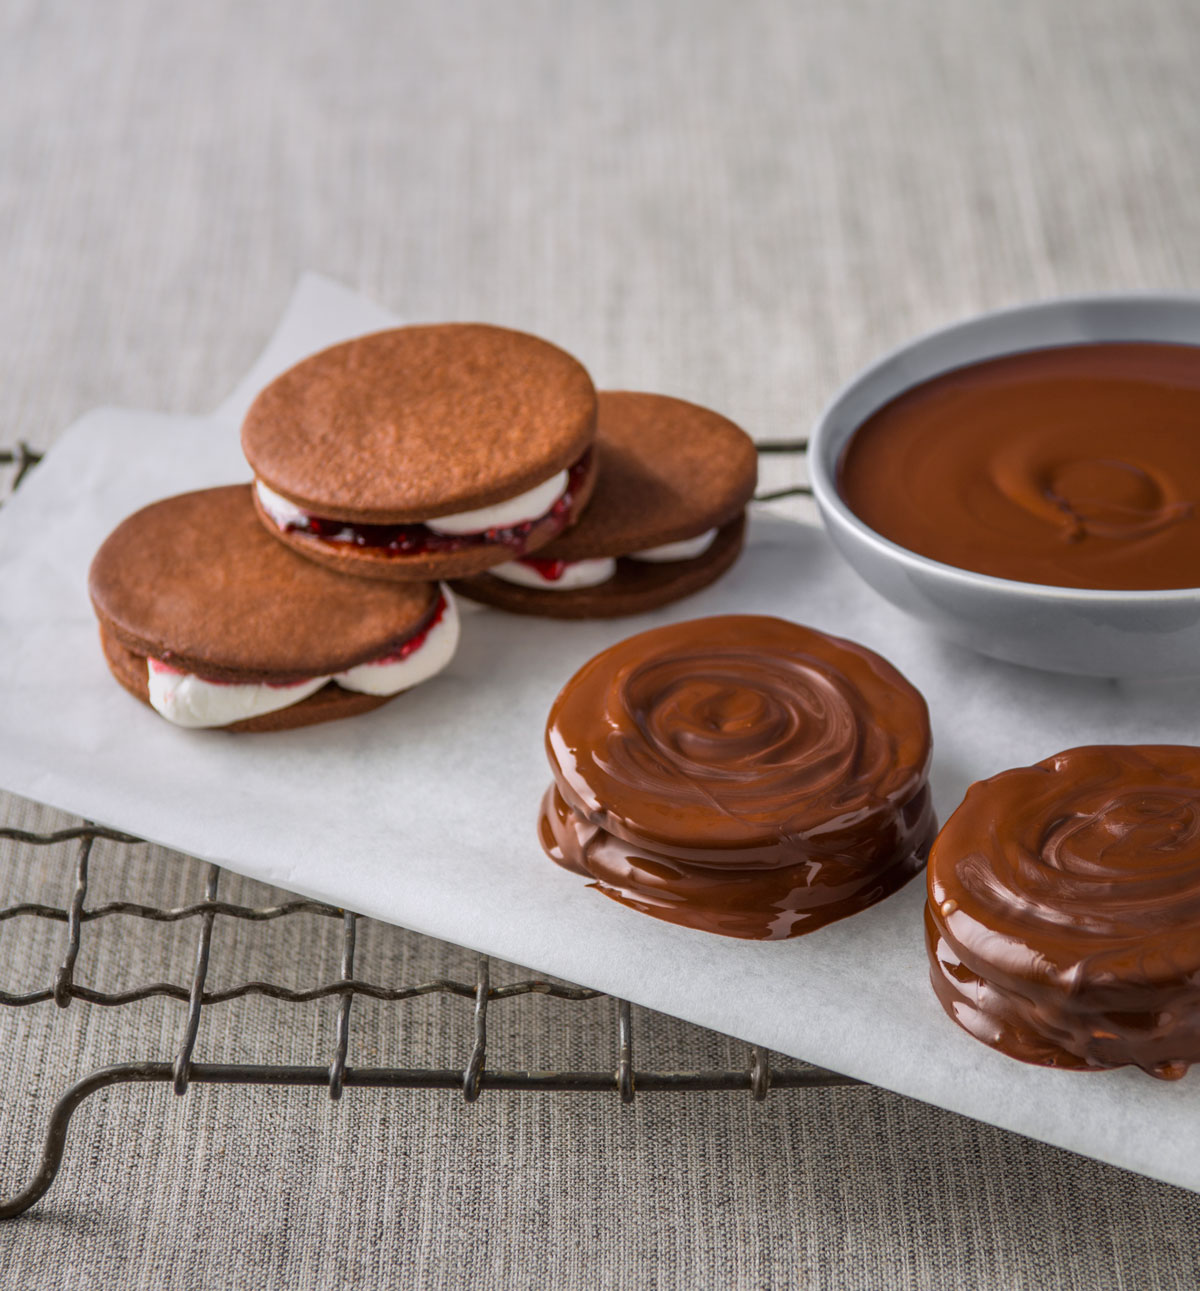 Haigh S Chocolates Make Haigh S Chocolate Wagon Wheels At Home